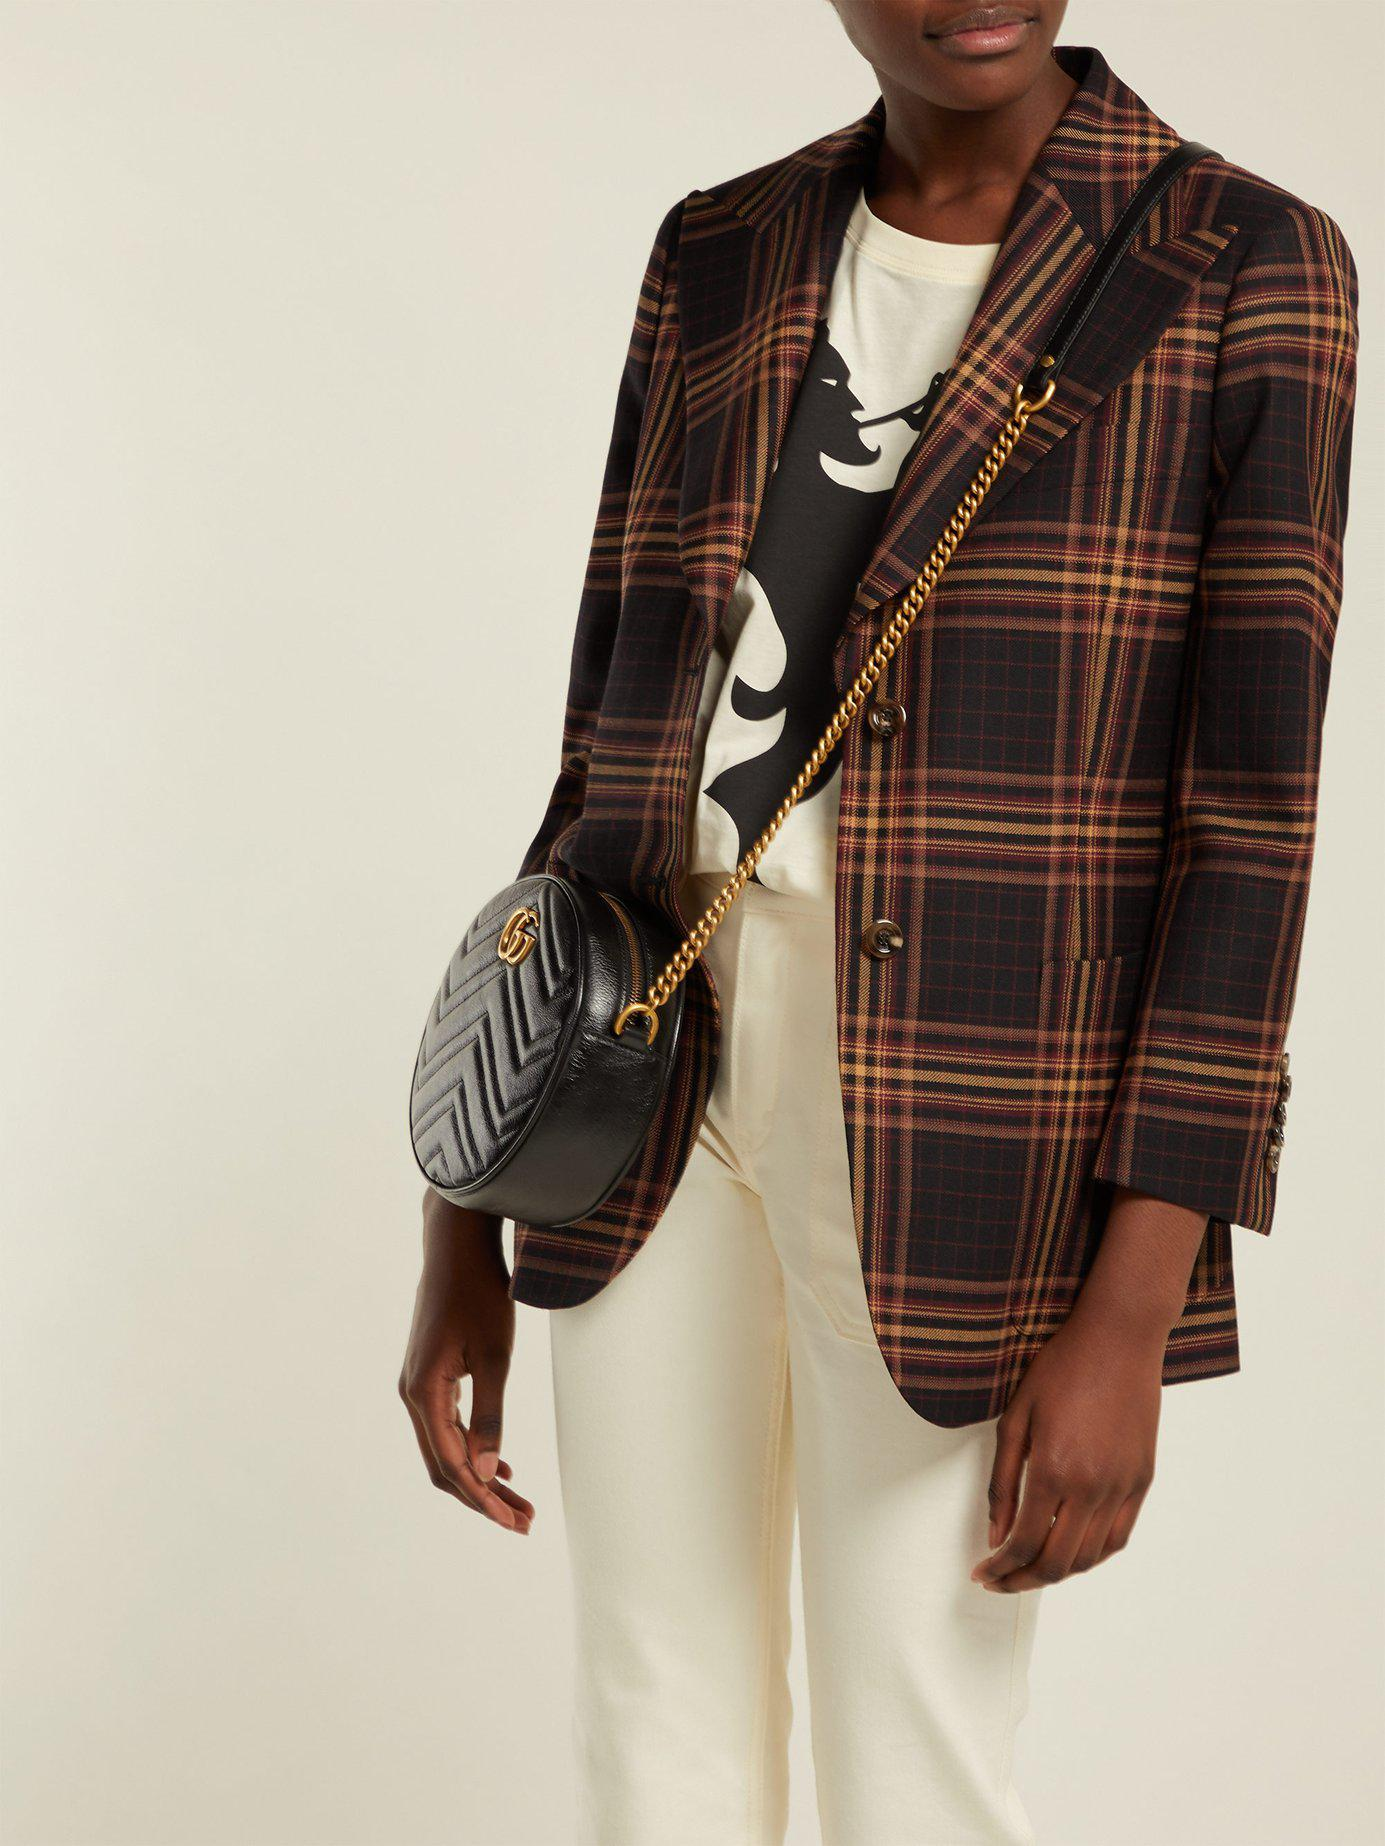 a0cbe07c4f Gucci - Black Gg Marmont Circular Leather Cross Body Bag - Lyst. View  fullscreen